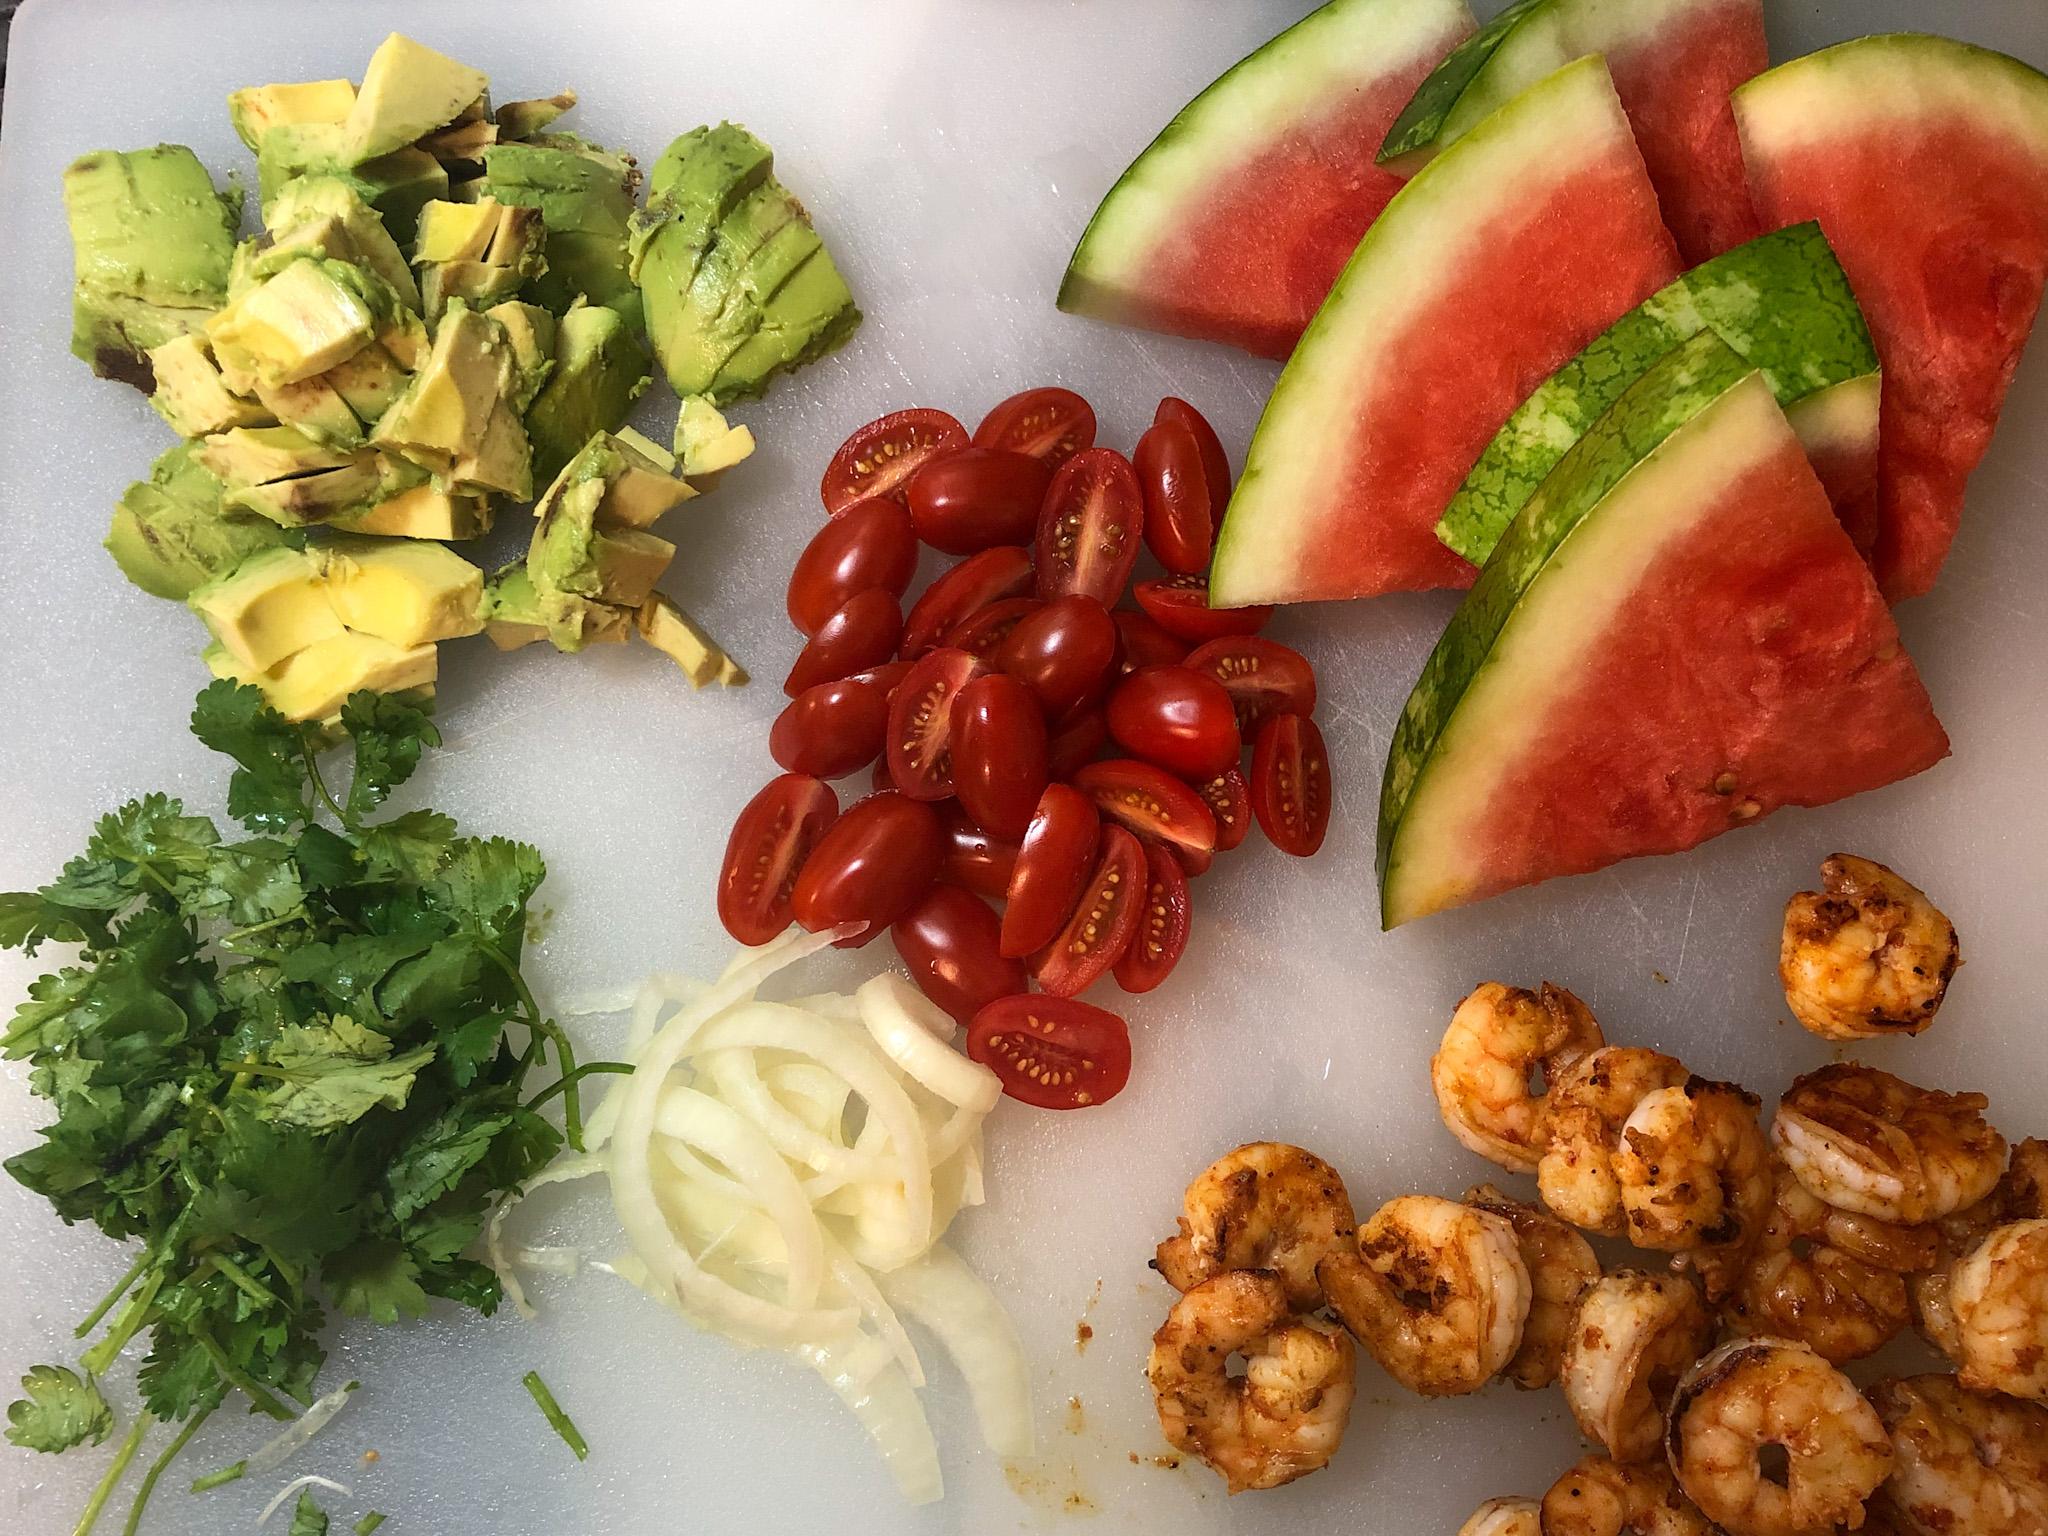 Chili Lime Shrimp, Avocado and Watermelon Salad